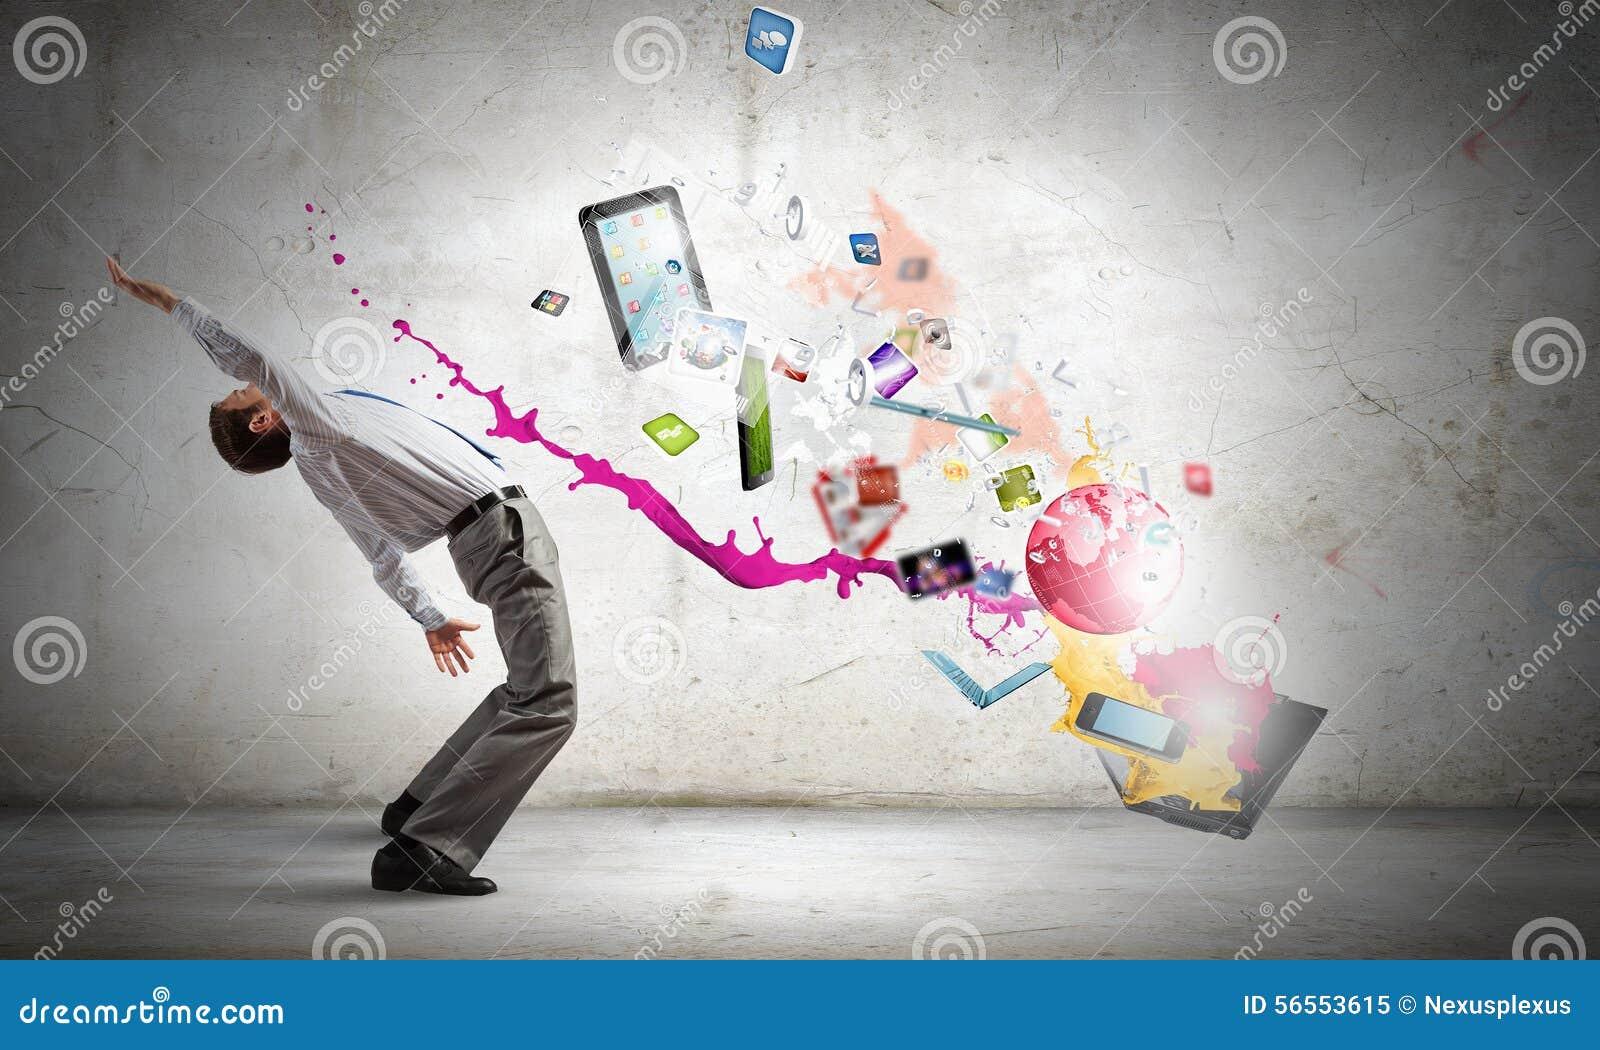 Download Ο επιχειρηματίας αποφεύγει τις ιδέες παφλασμών Στοκ Εικόνα - εικόνα από παφλασμός, συγκεντρωμένος: 56553615